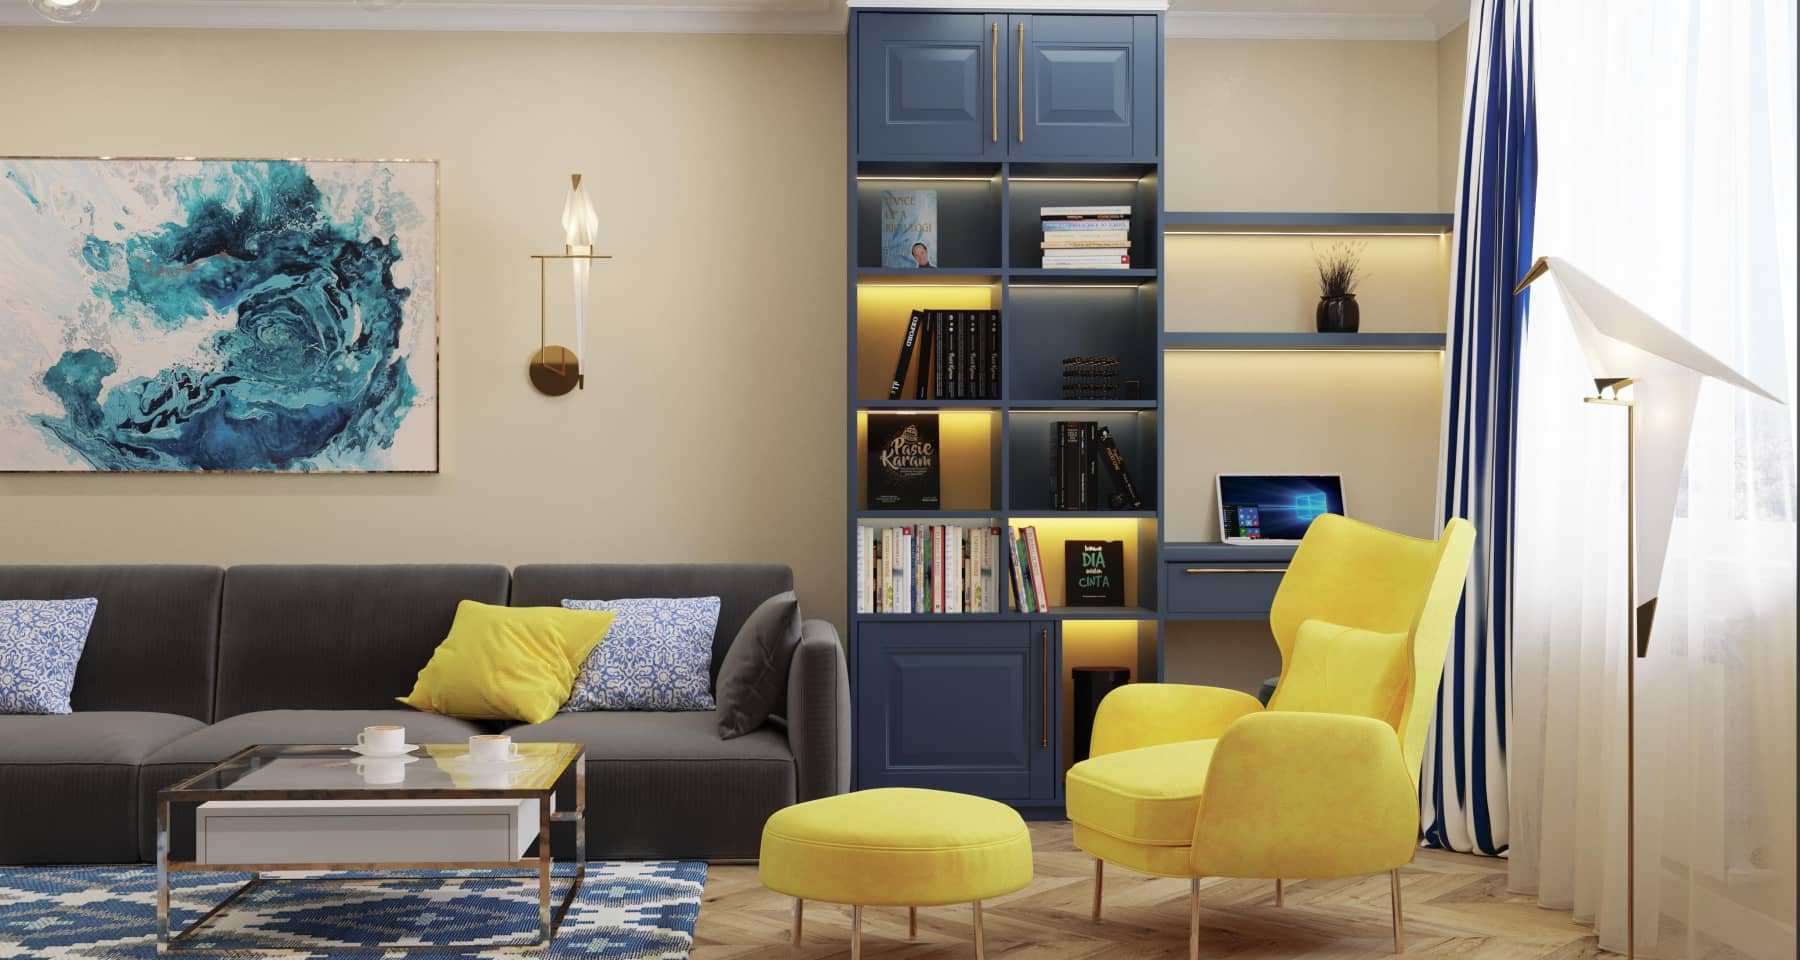 Дизайн 4-комнатной квартиры в стиле эклектика